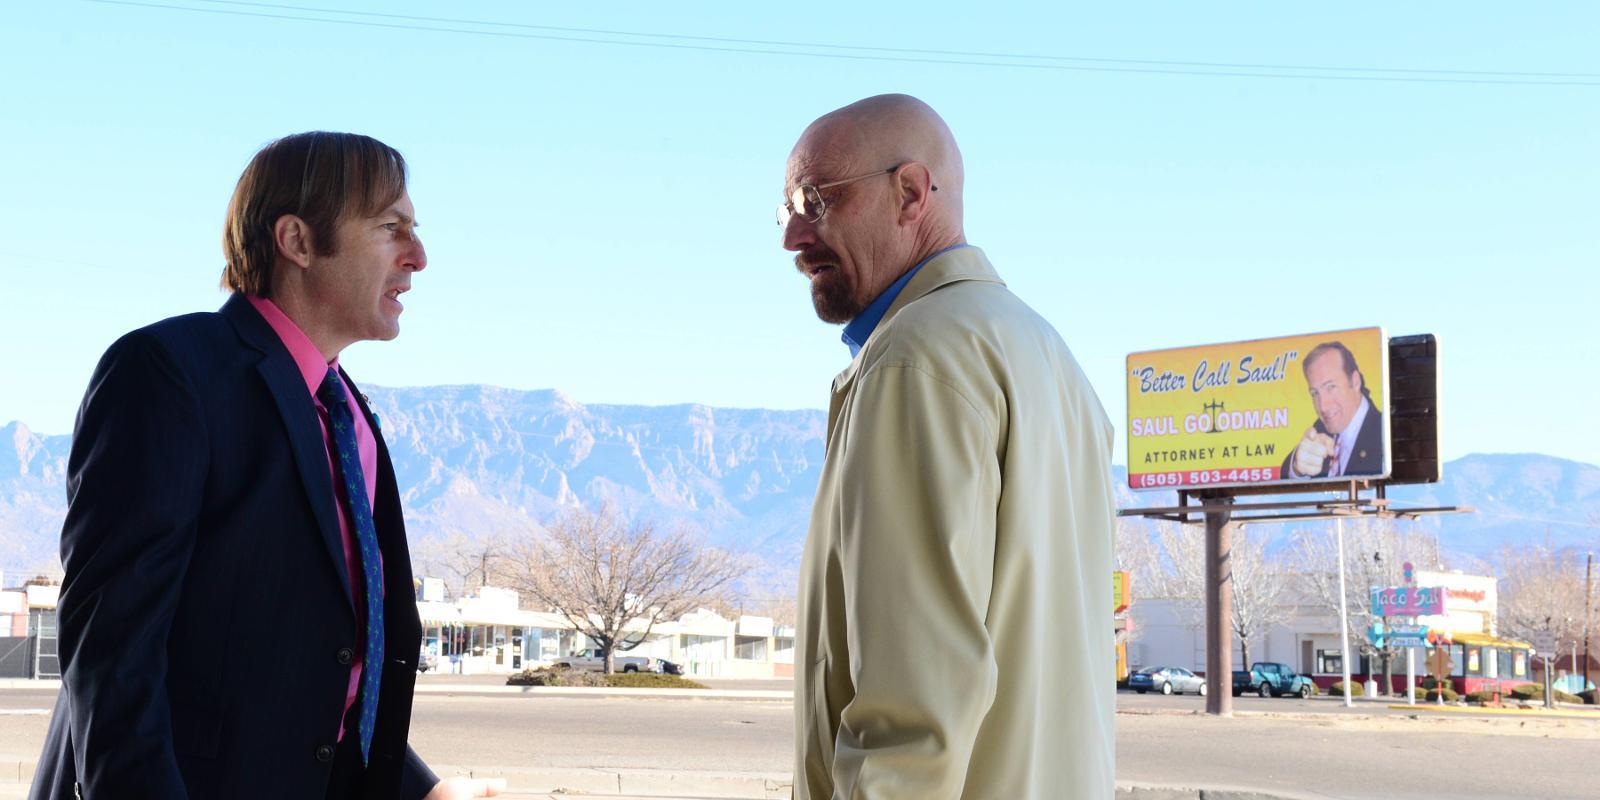 Better Call Saul Season 4 Trailer | ScreenRant |Better Call Saul Characters